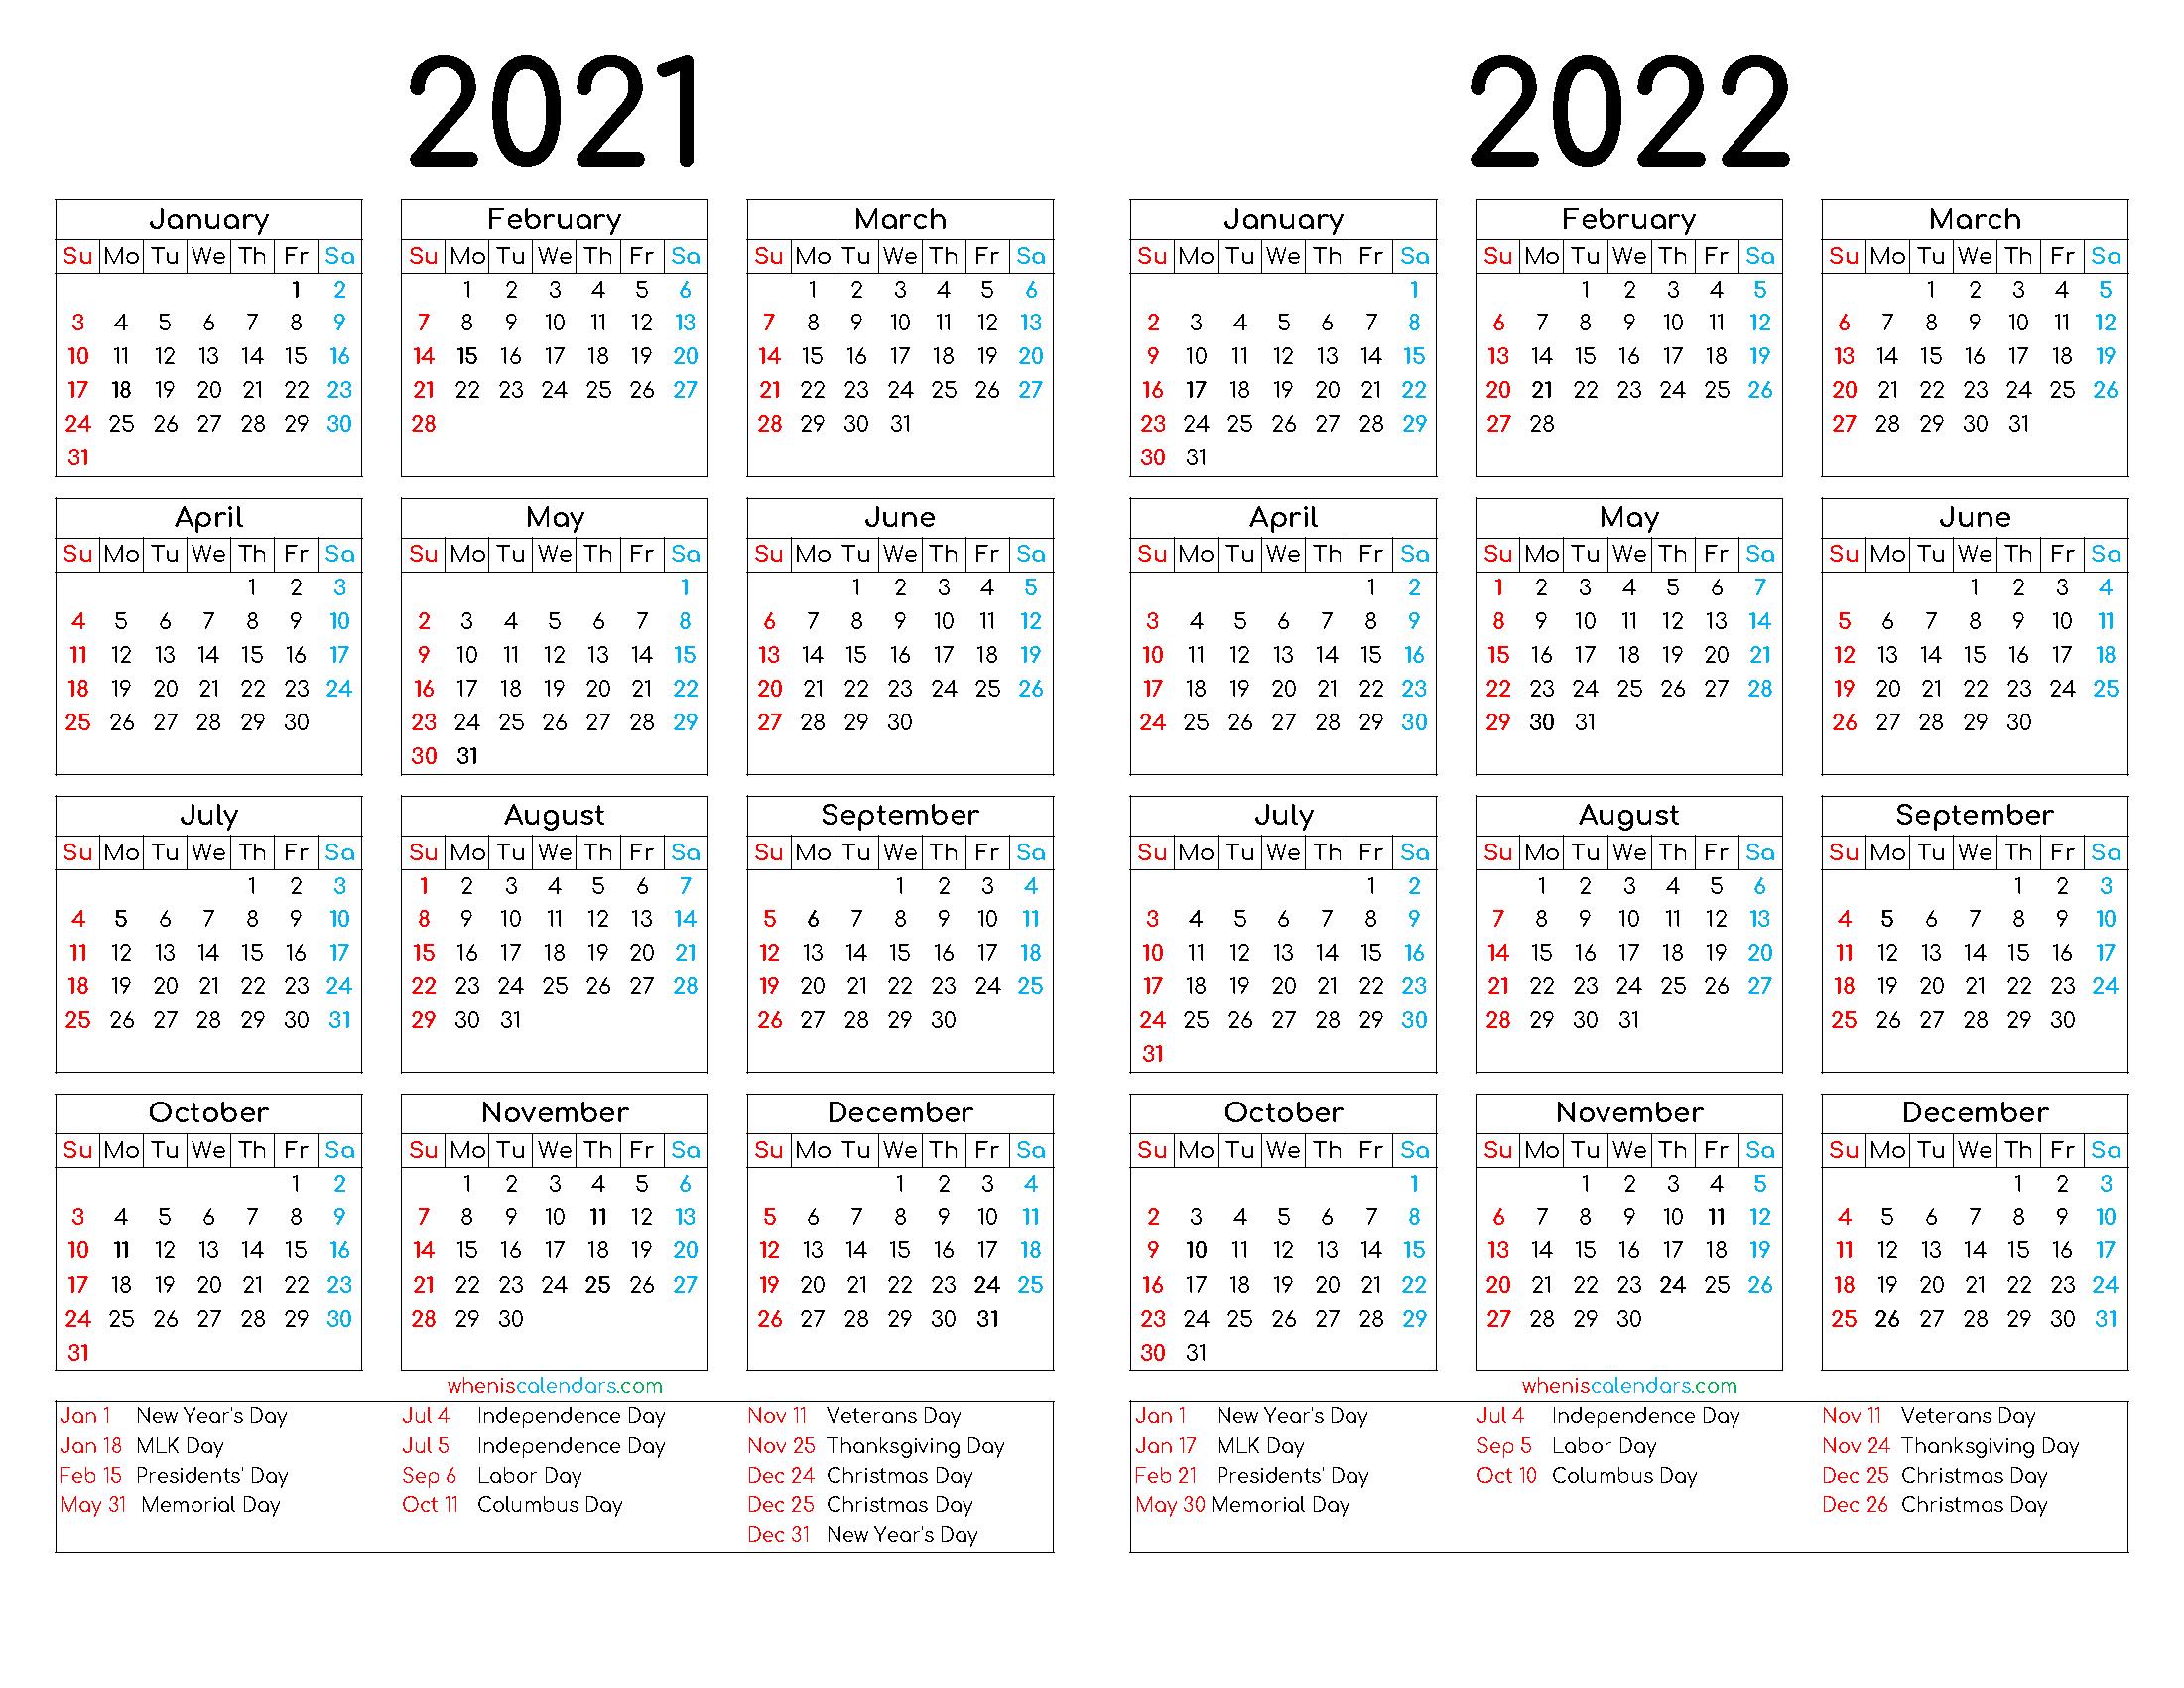 2022 Downloadable Calendar.2021 And 2022 Calendar Printable 12 Templates Calendar Printables Templates Printable Free Calendar